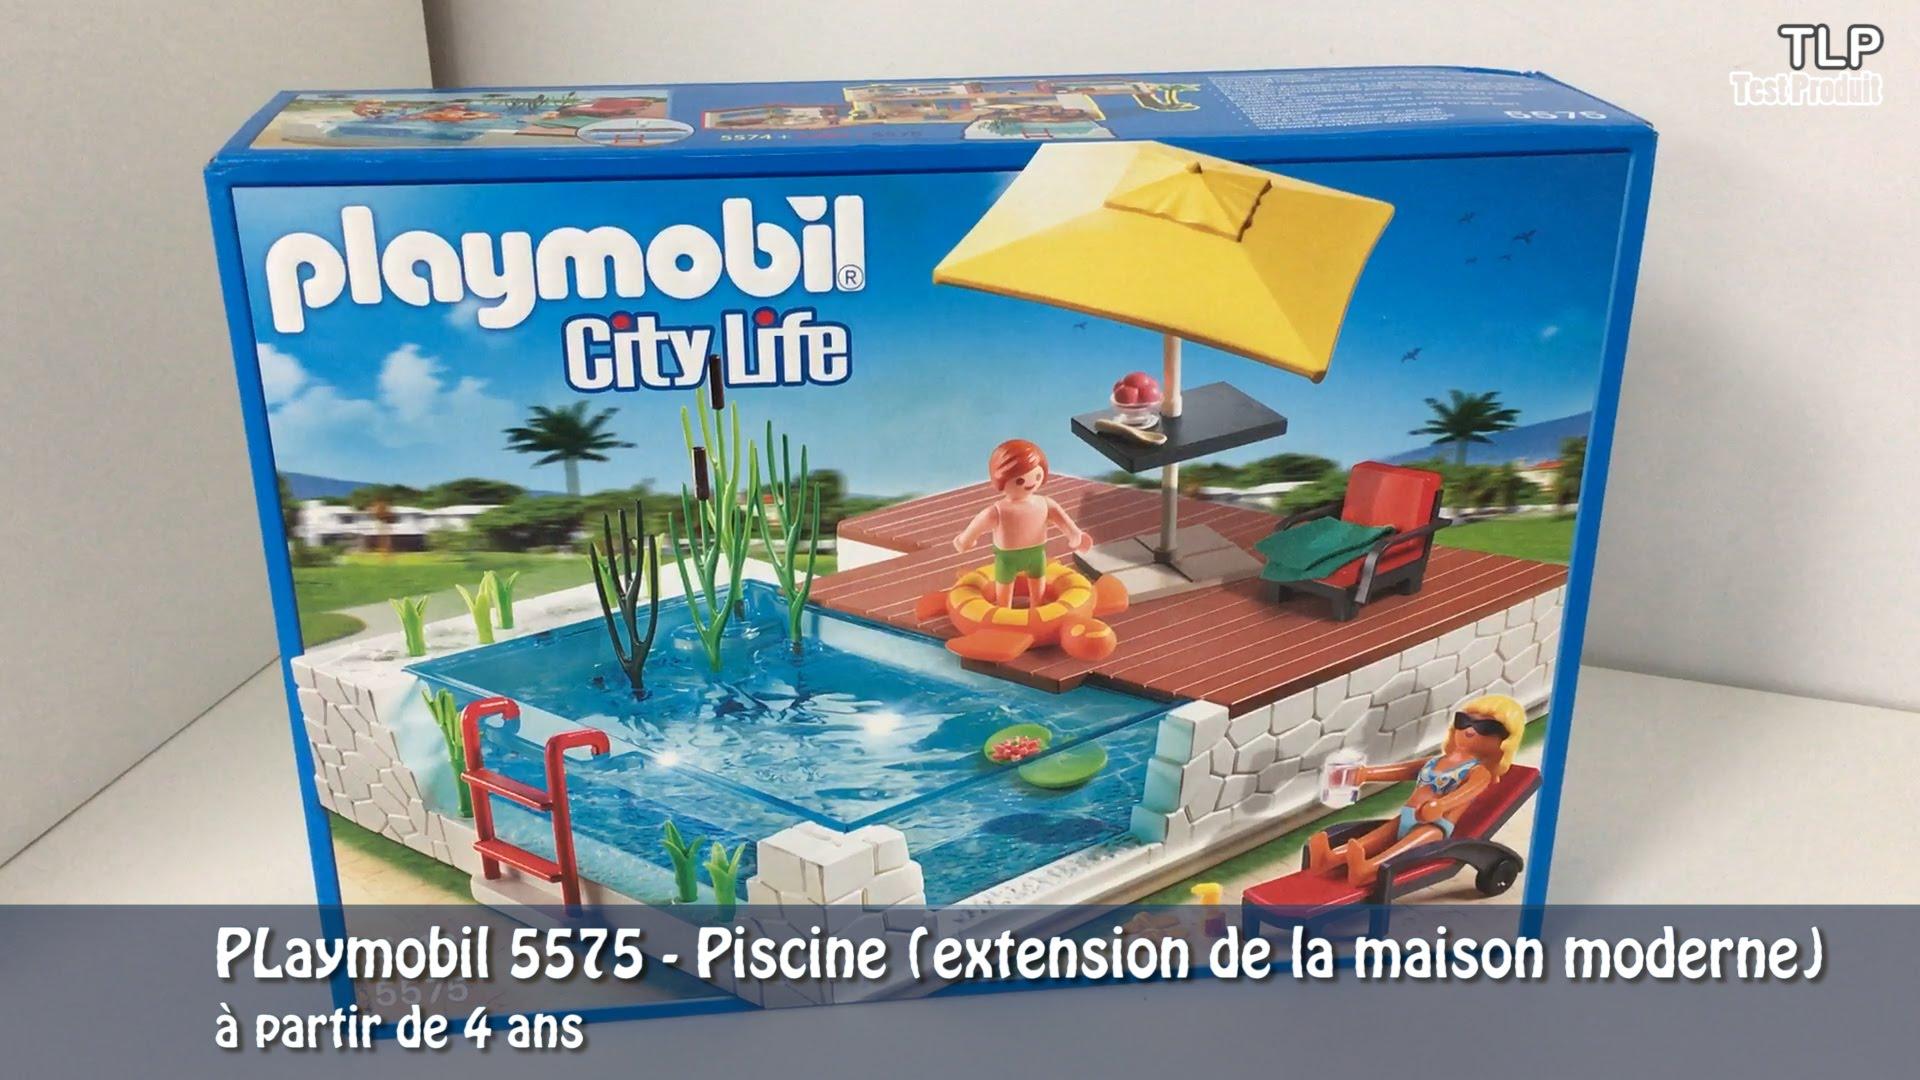 Playmobil city life la maison moderne - stepindance.fr